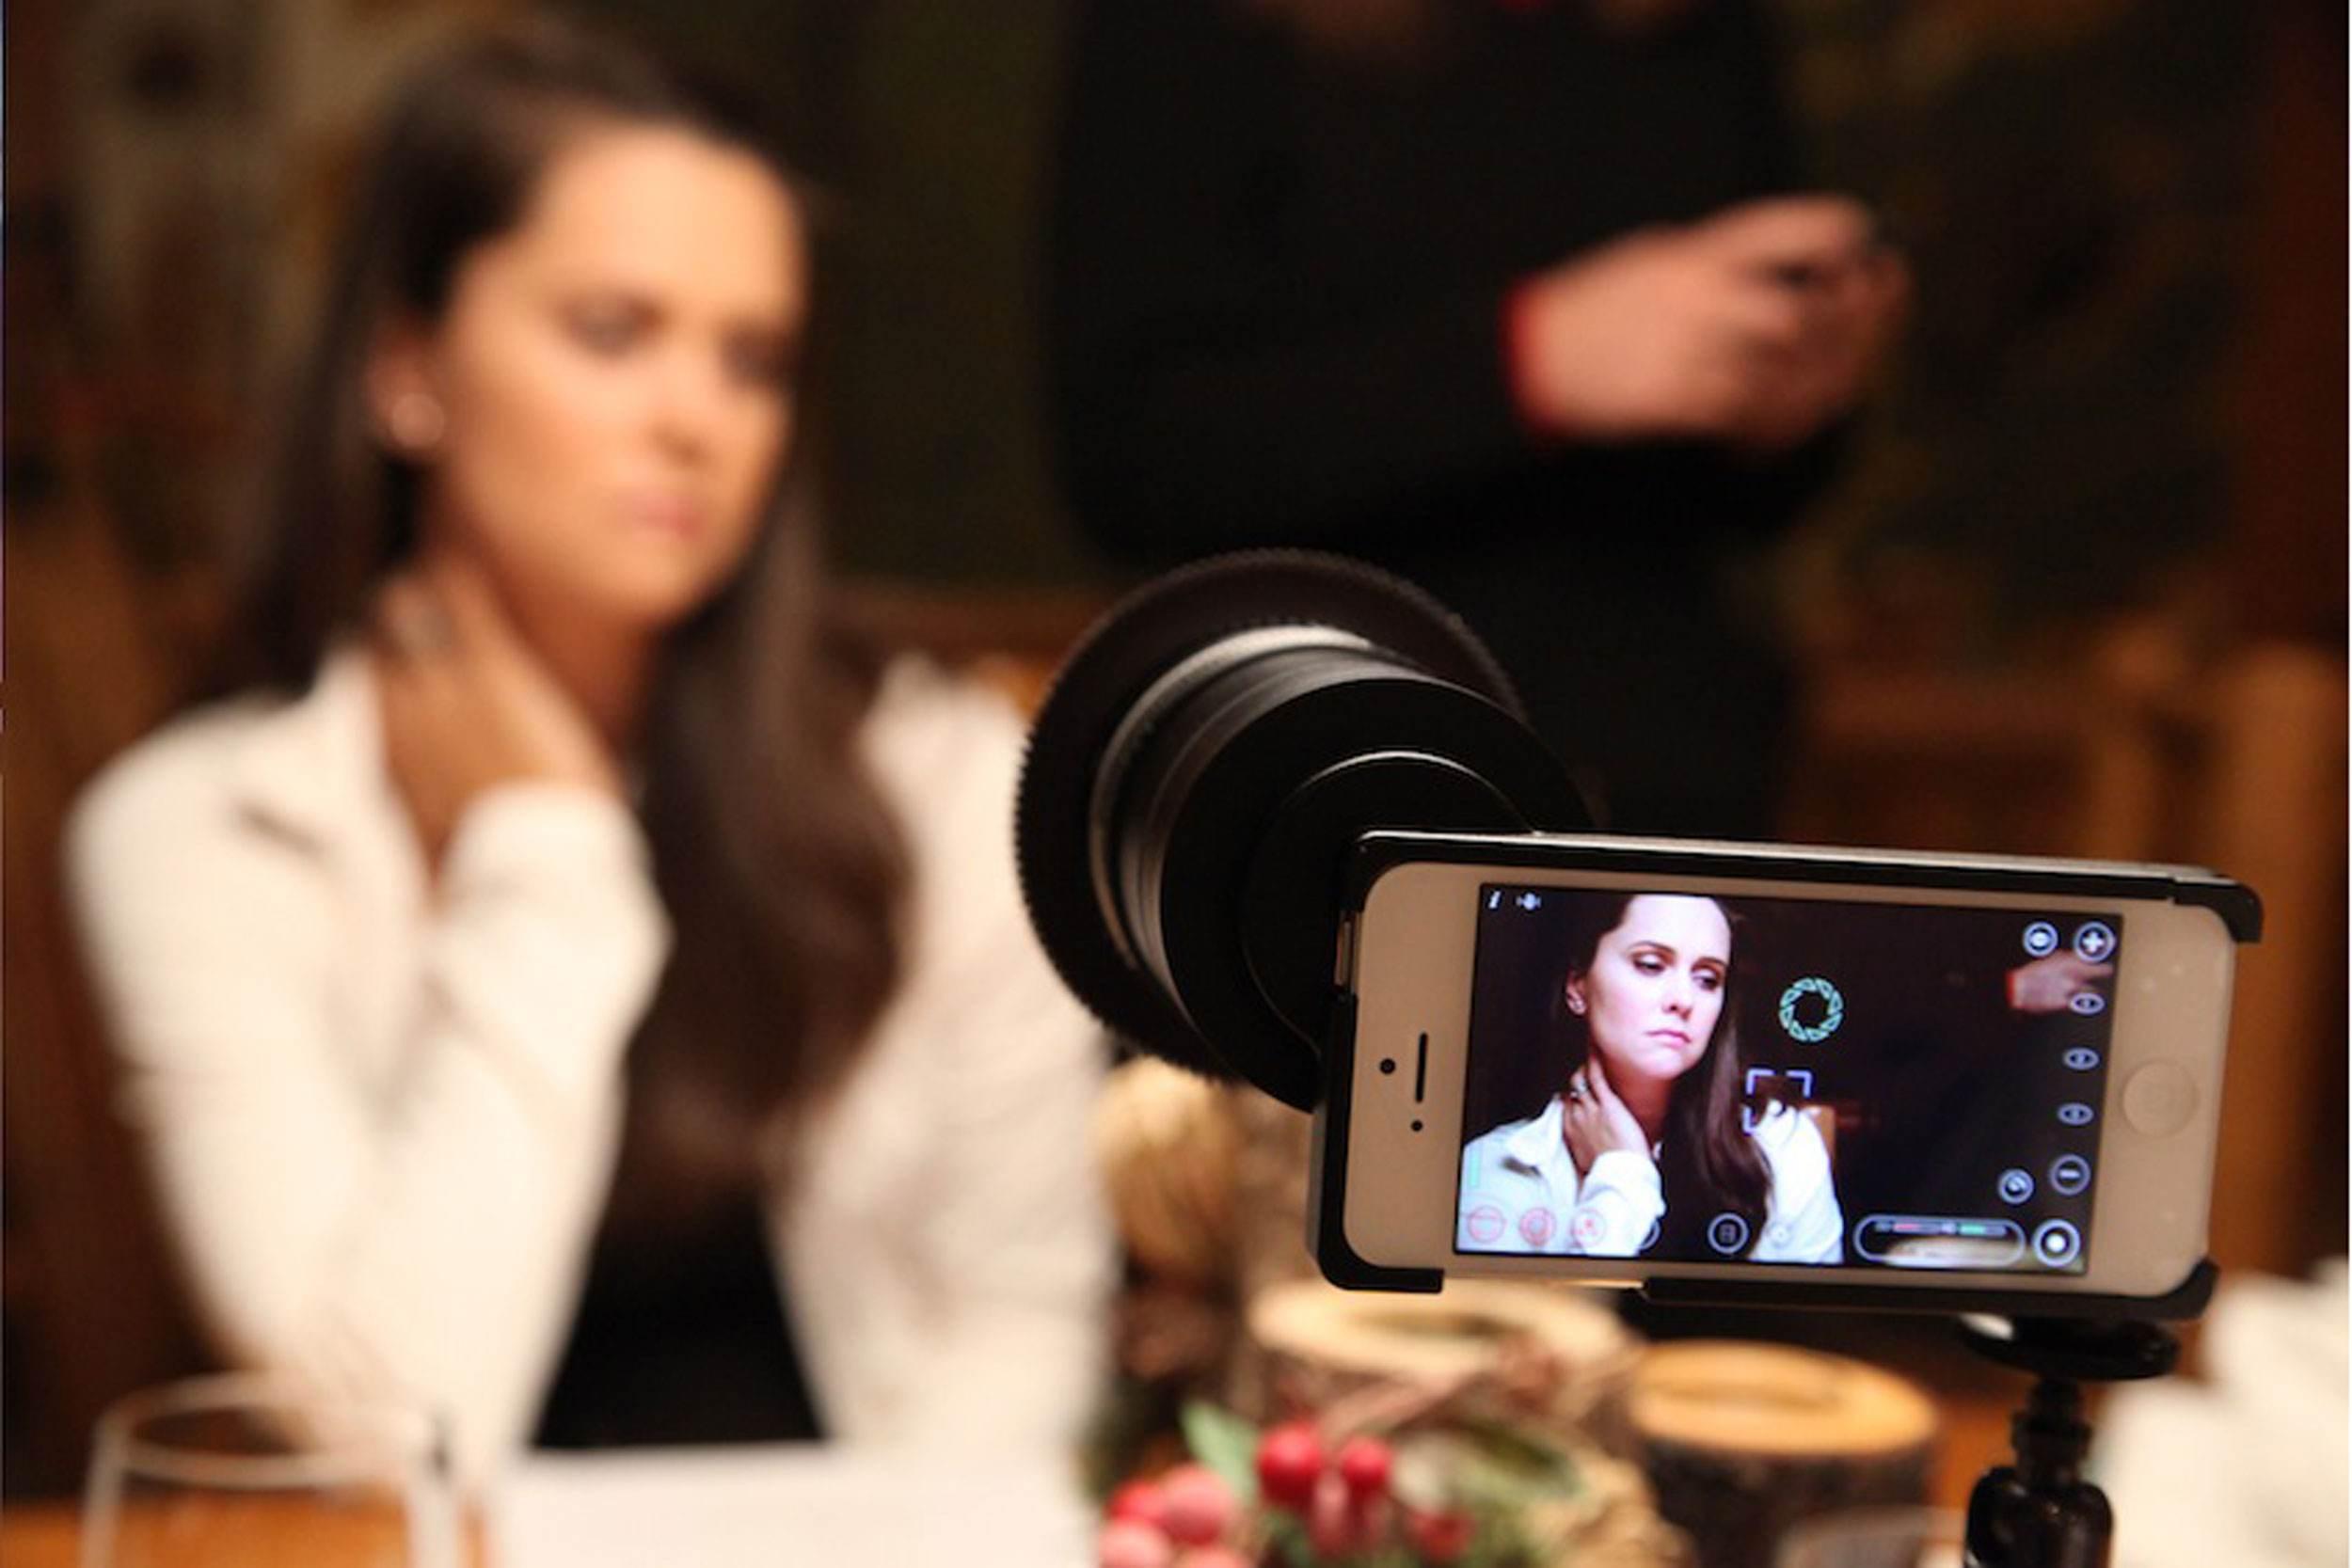 UGC视频广告变现犹如困兽,AR技术能否打开囚笼?